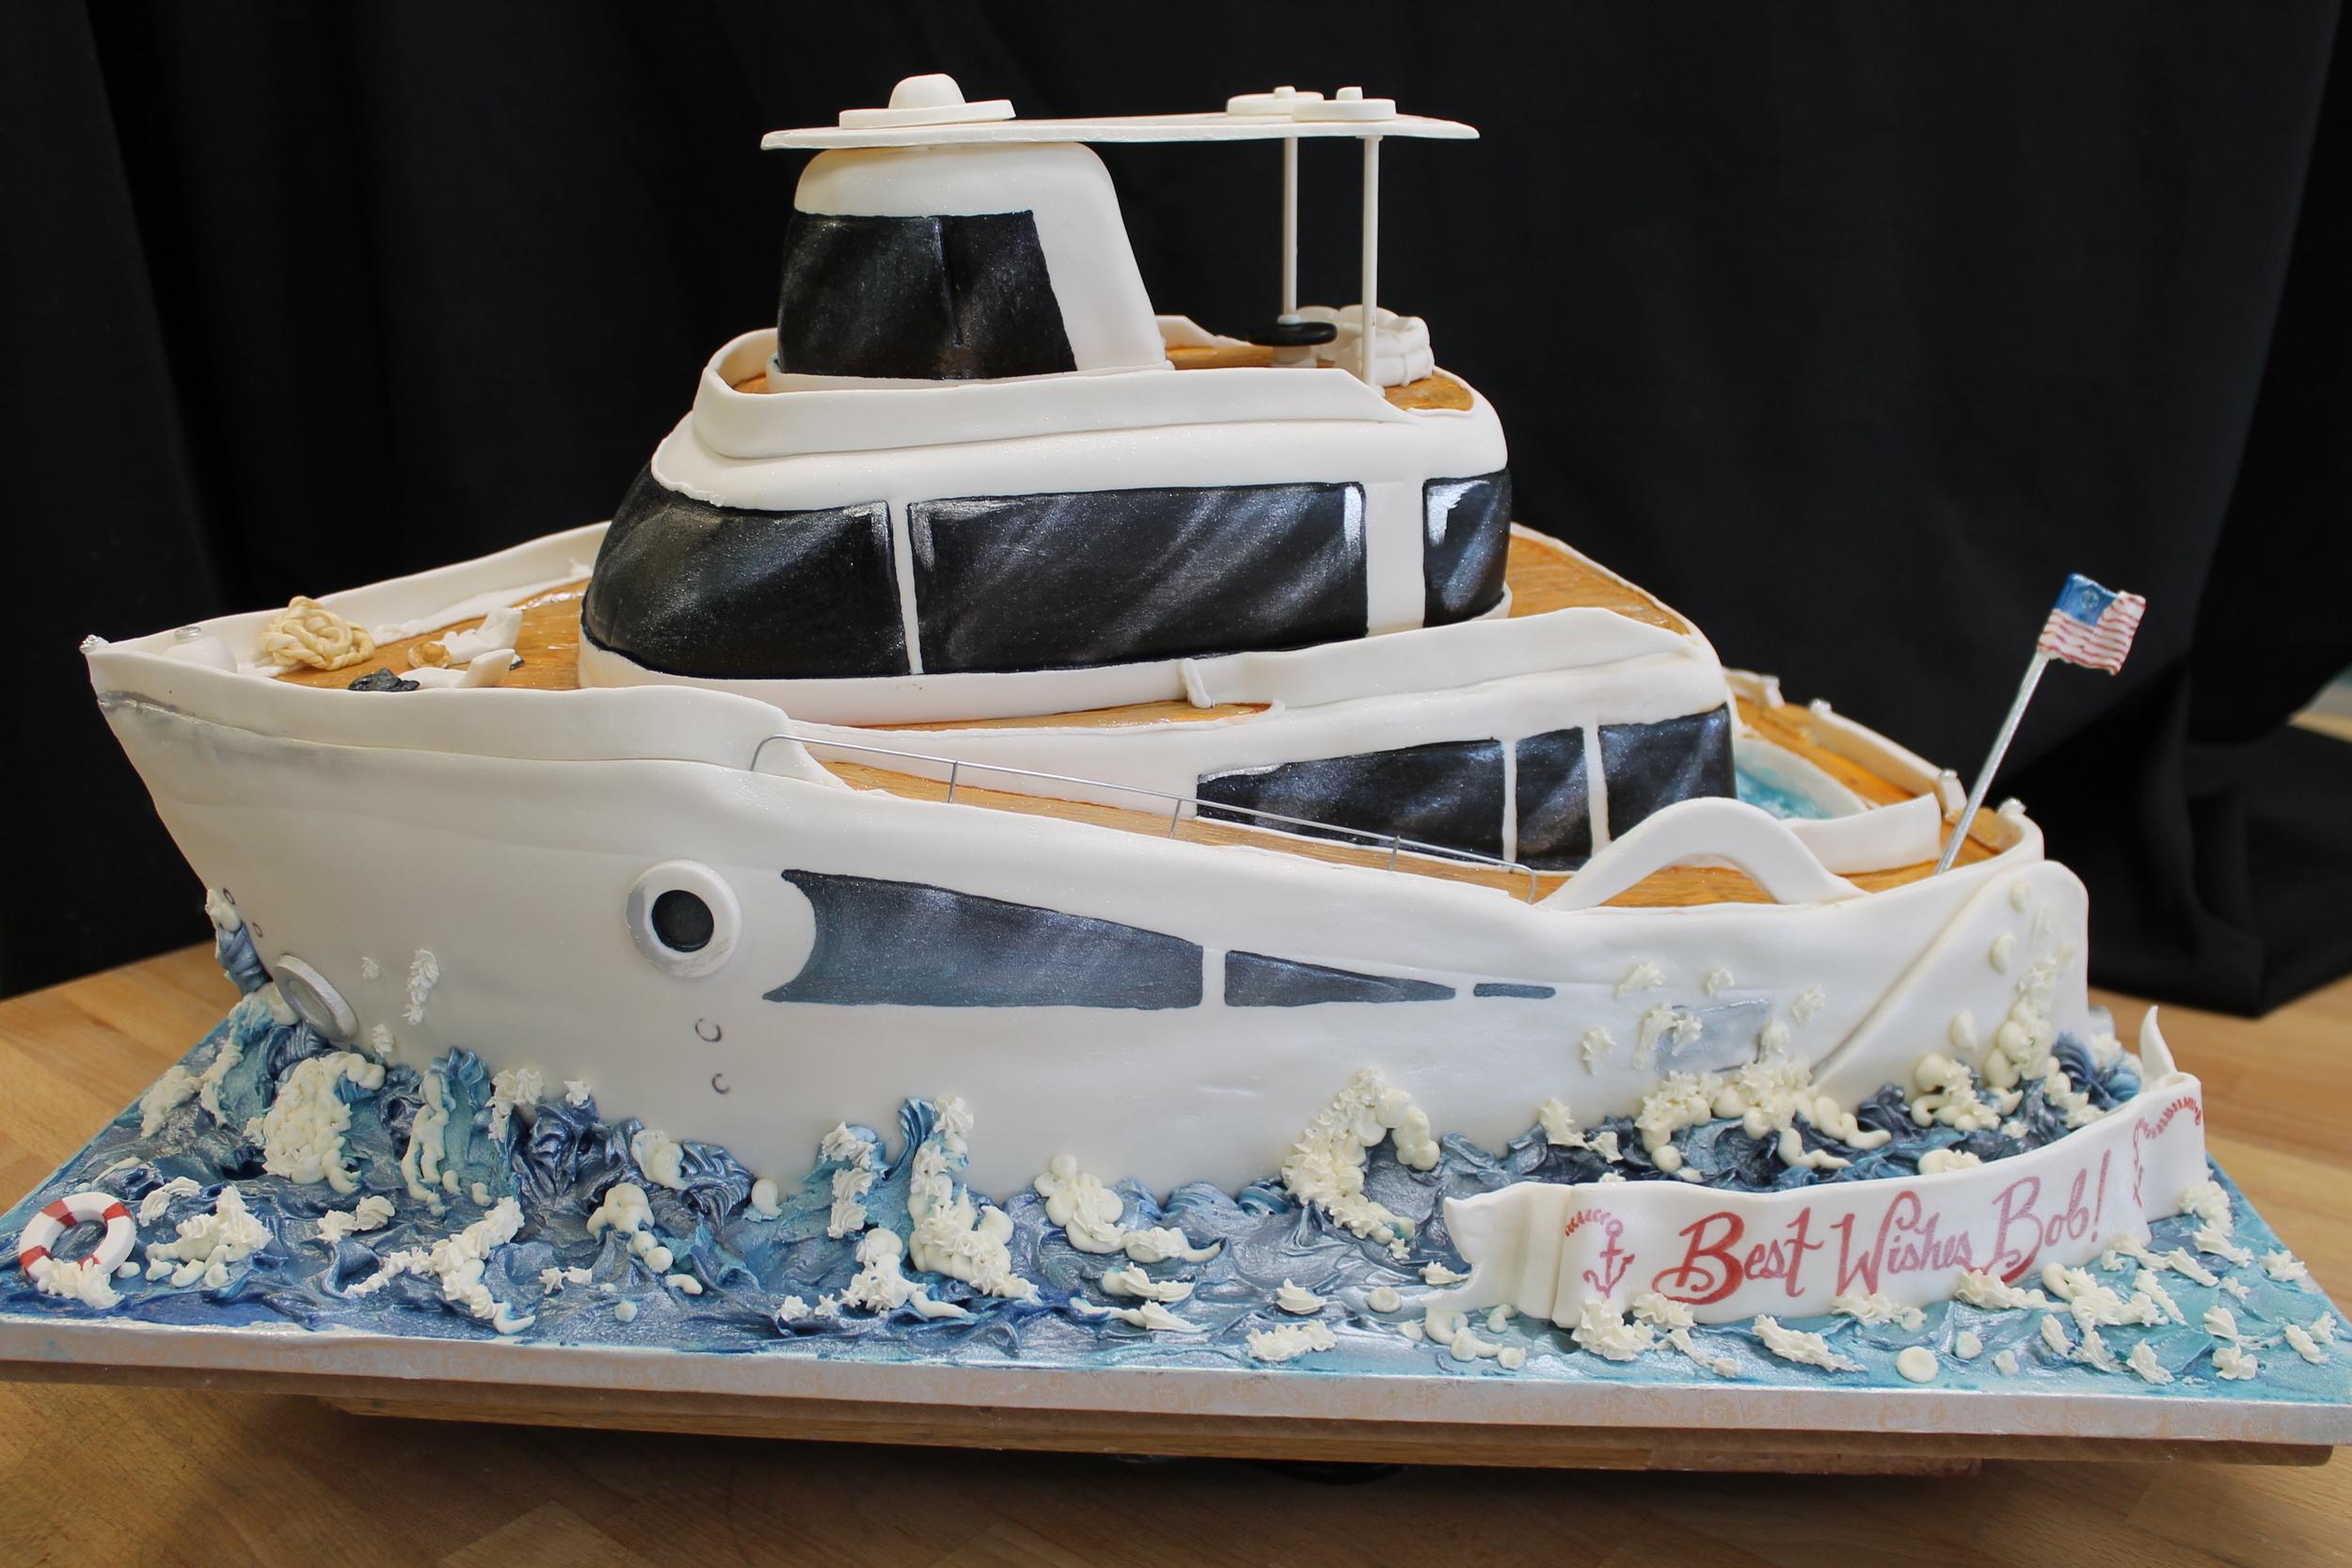 Retirement Yacht for Bob Cake